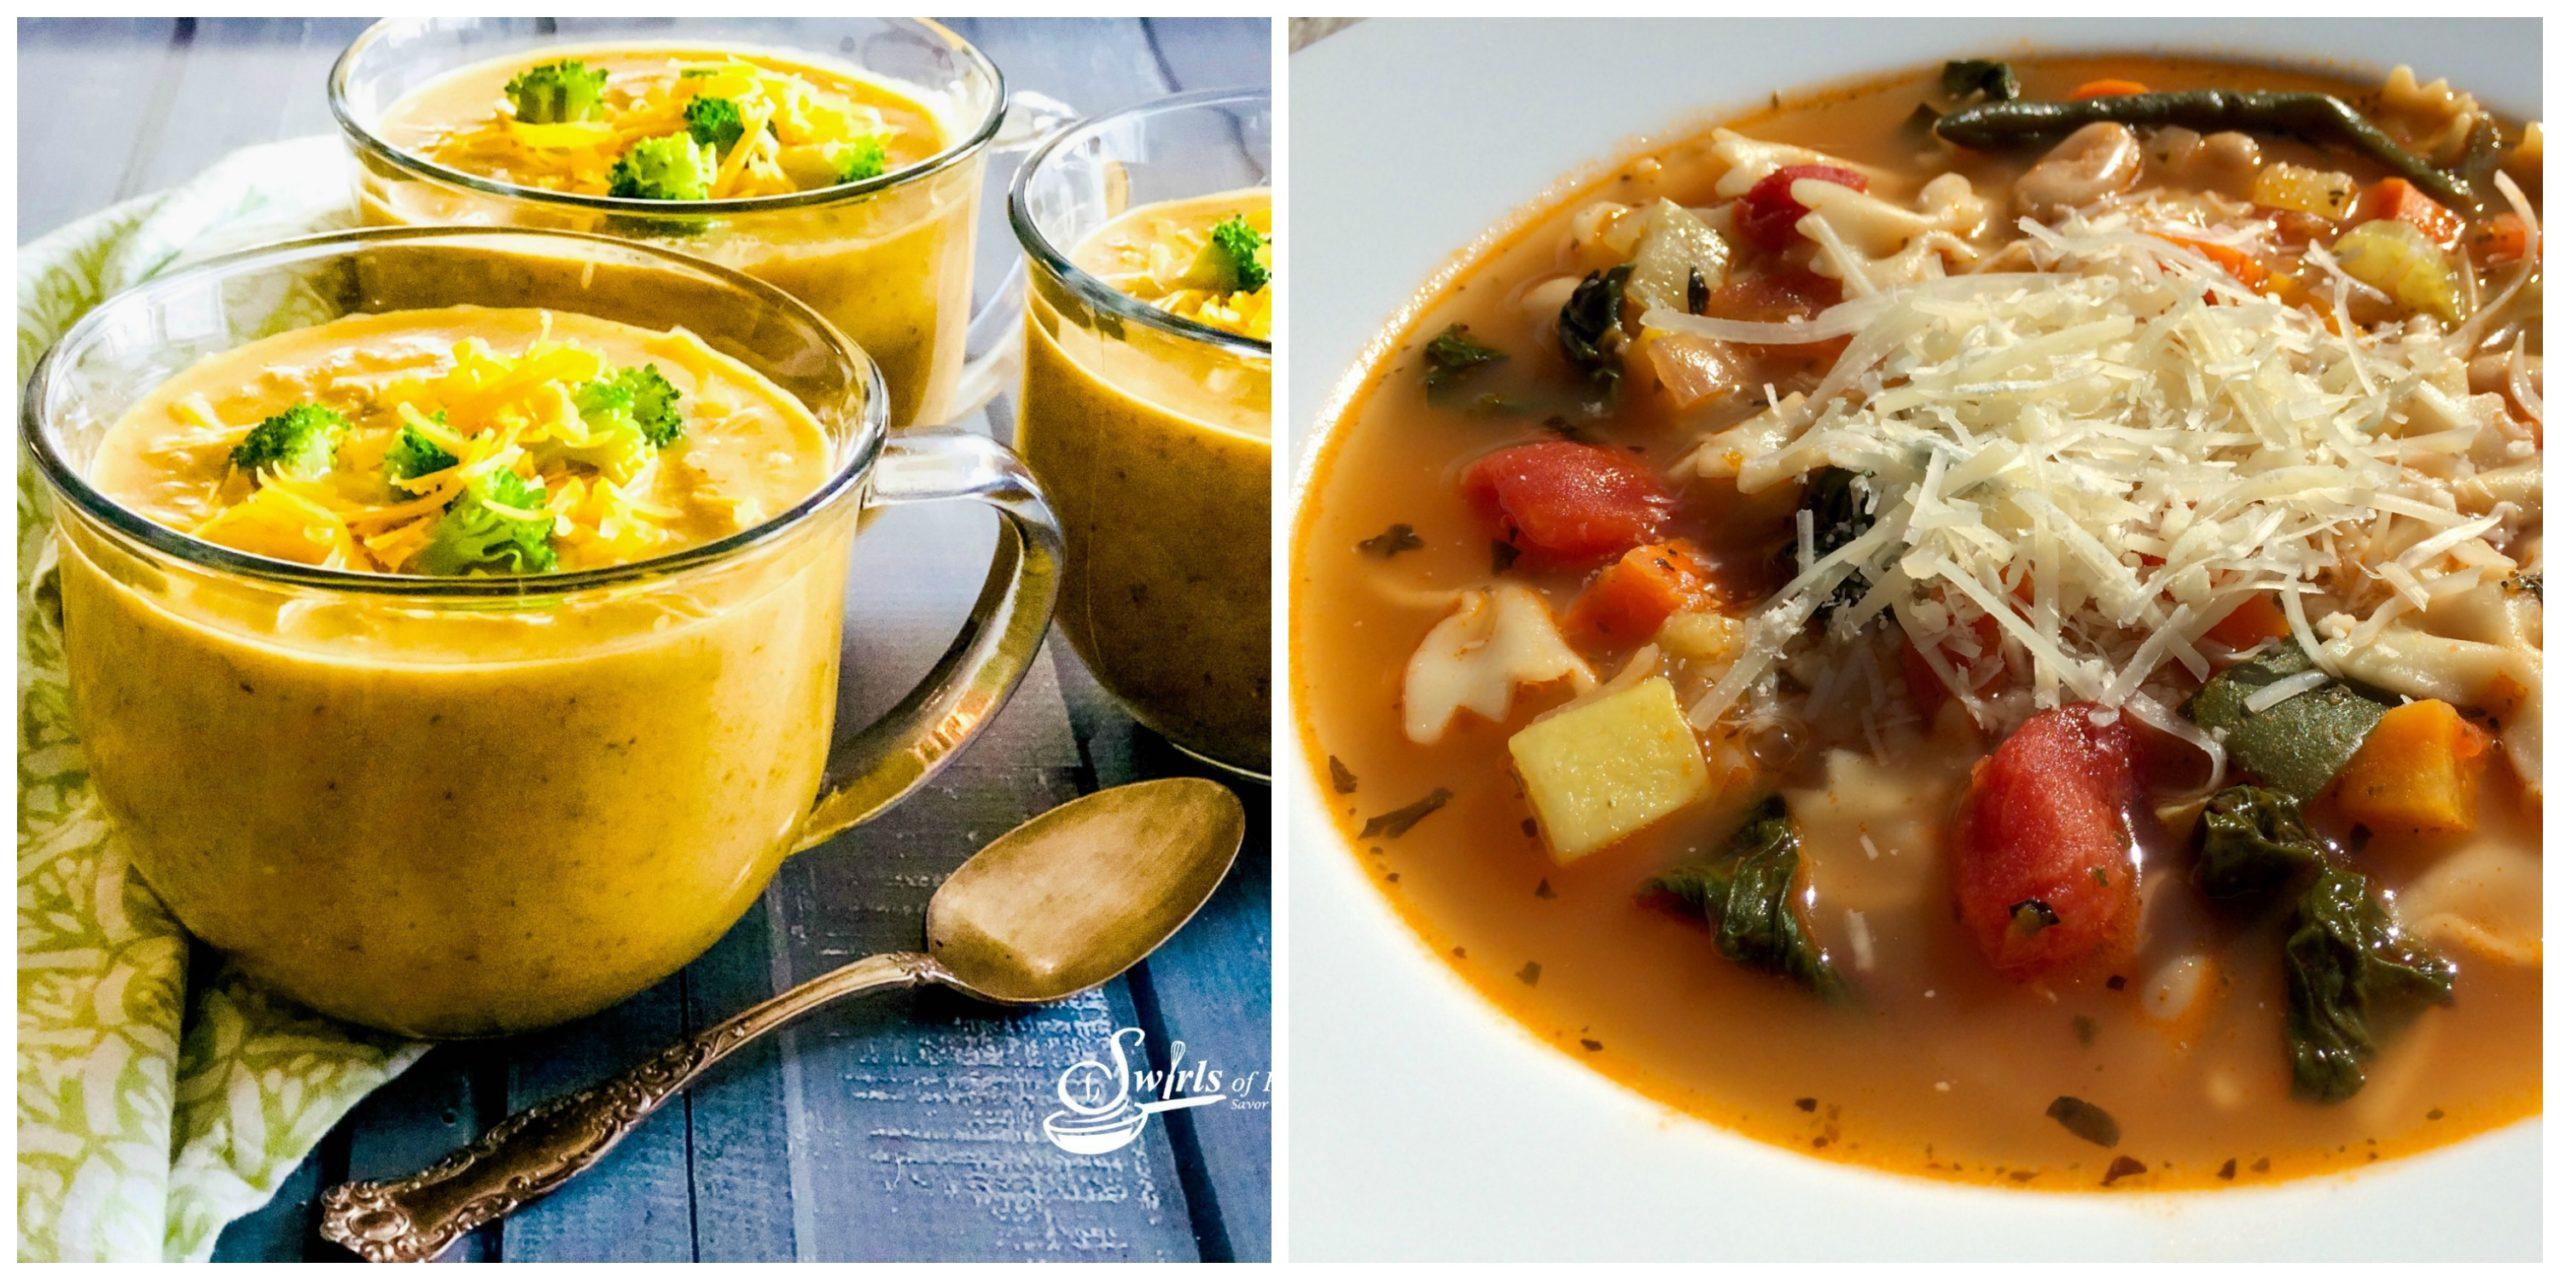 Cheddar Broccoli Soup and Pesto Minestrone